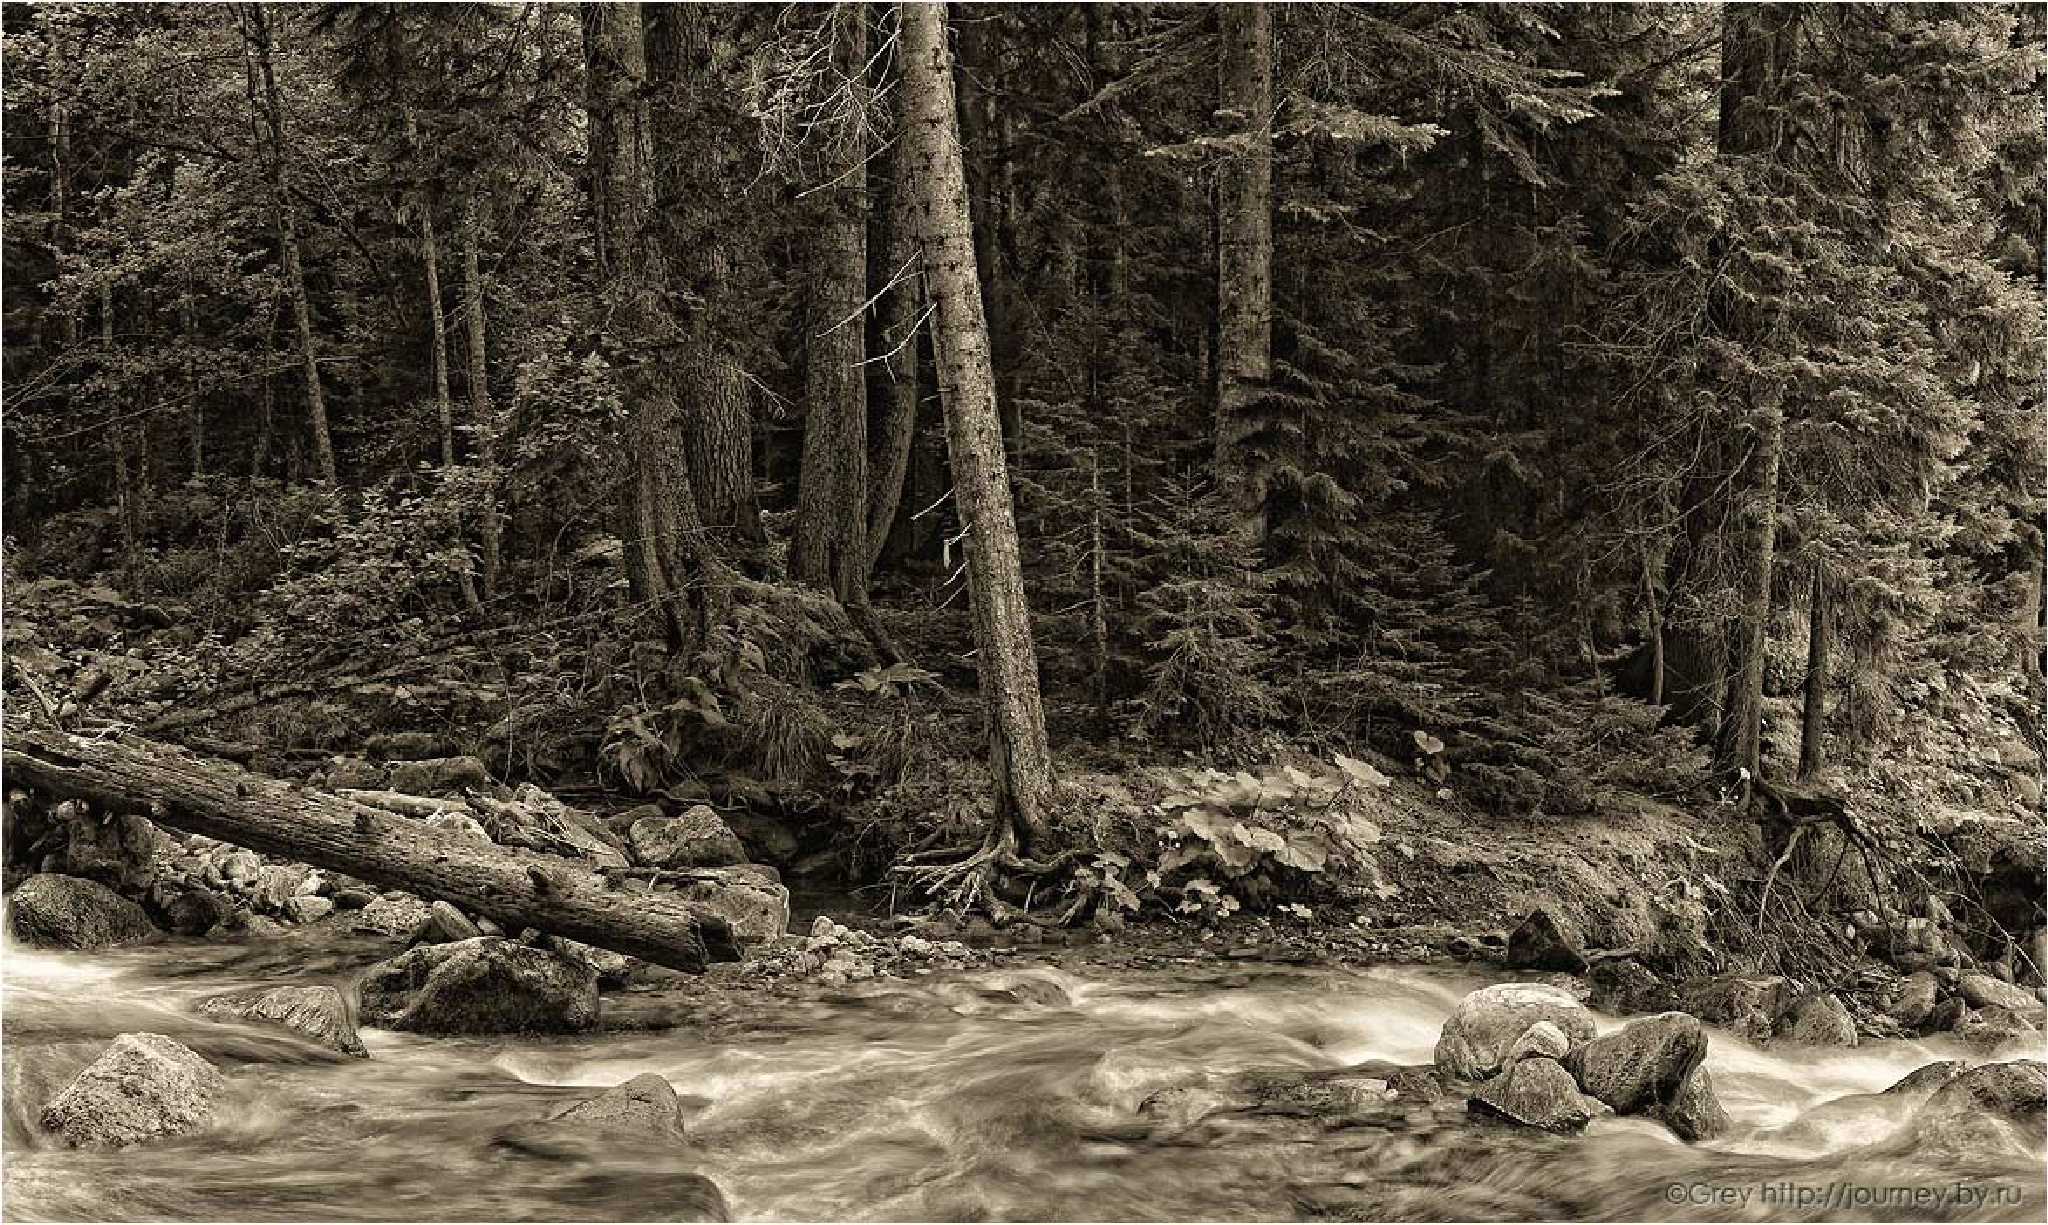 Wilderness nature reserve by Sergey Pavlov